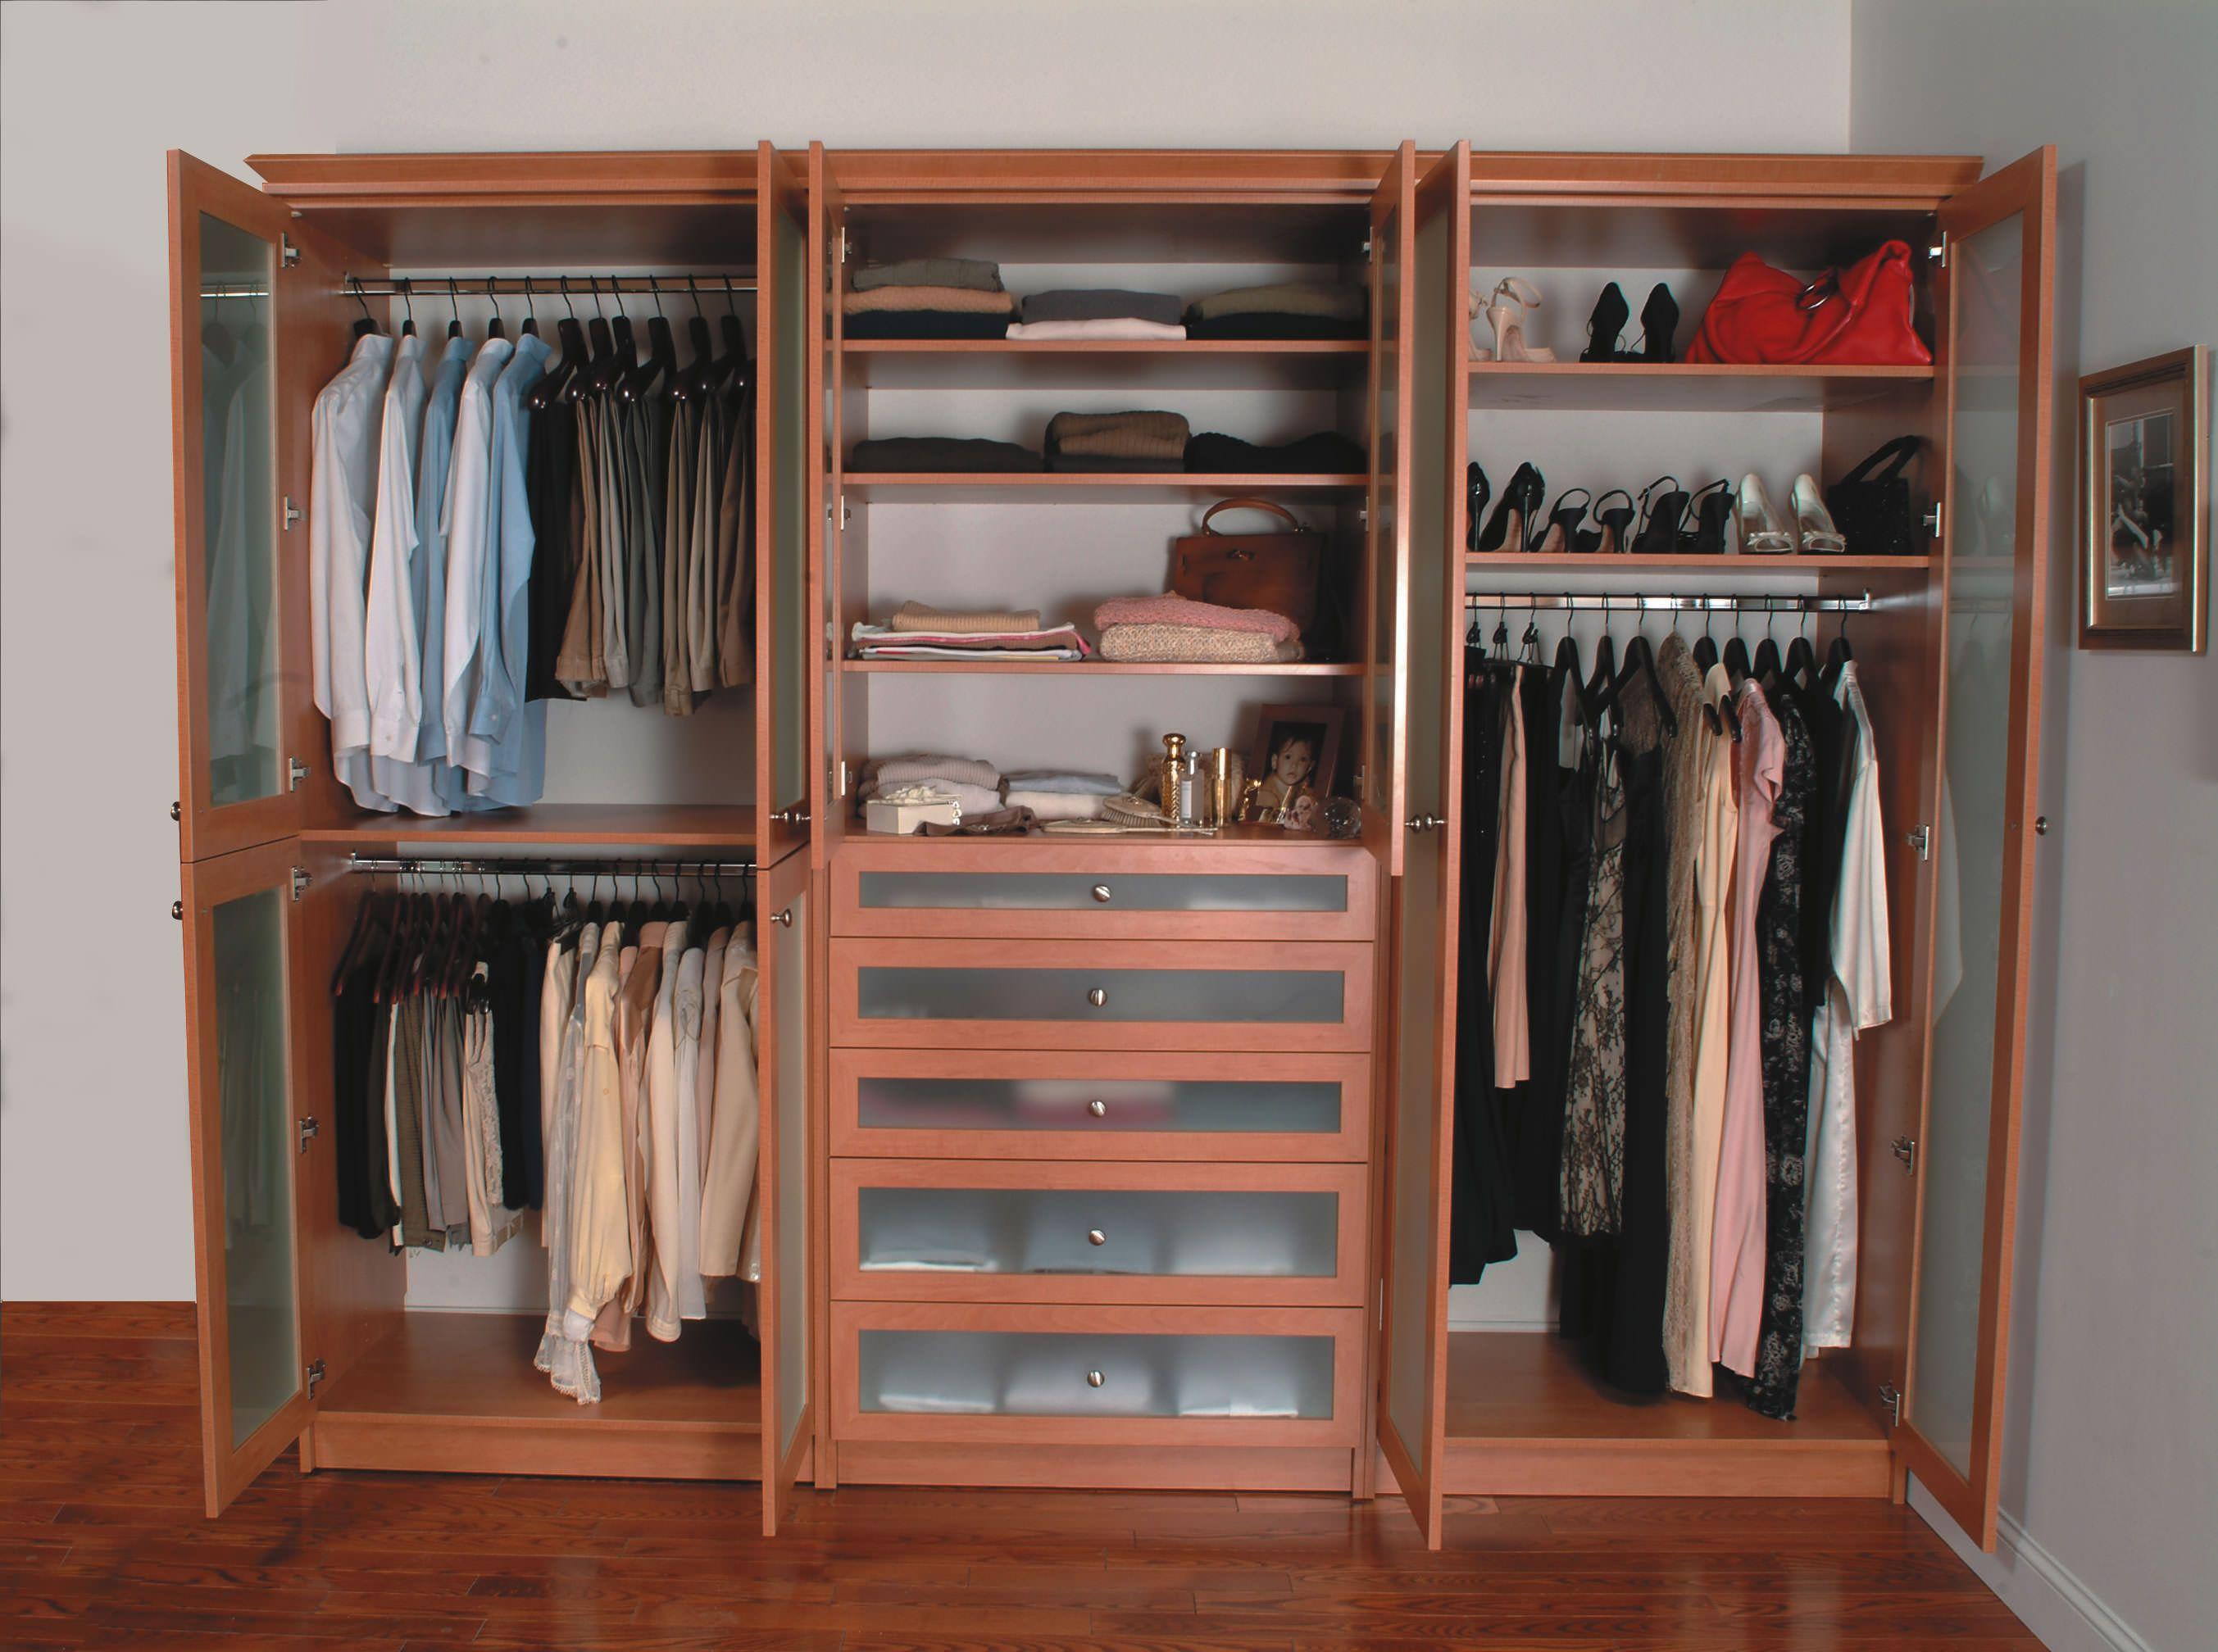 31 Stunning Closet Works Storage Designs And Projects Closet Small Bedroom Small Bedroom Closet Design Bedroom Closet Design